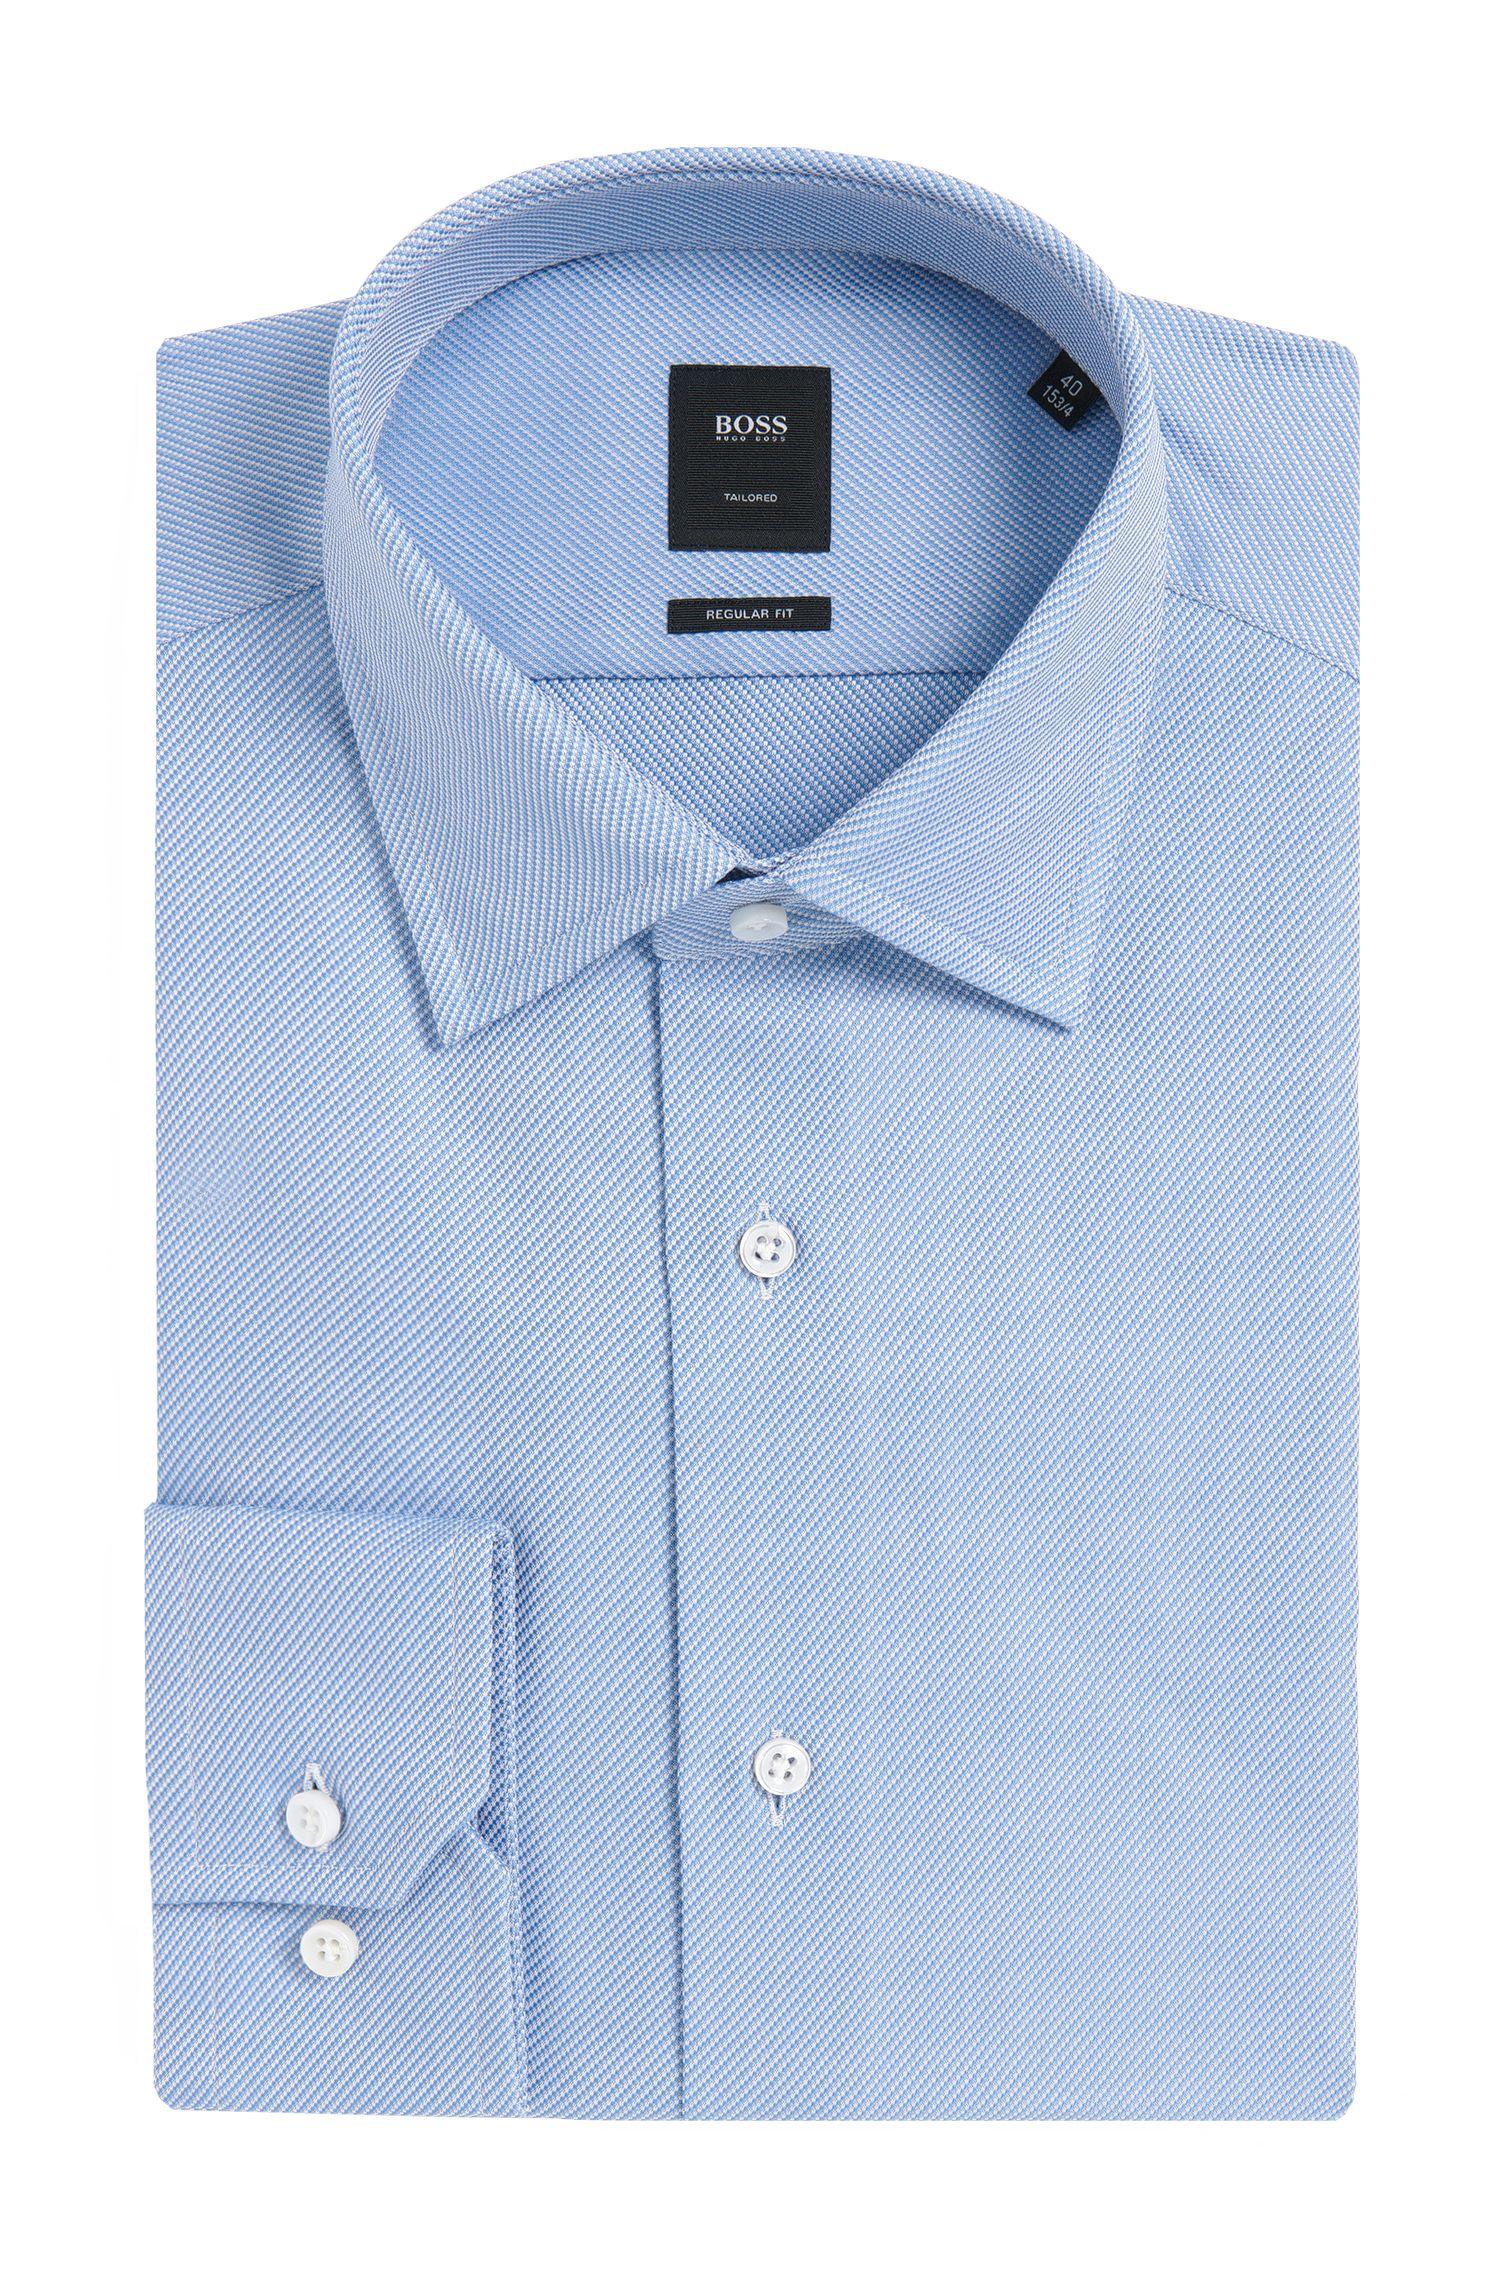 'T-Stuart' | Regular Fit, Italian Cotton Dress Shirt